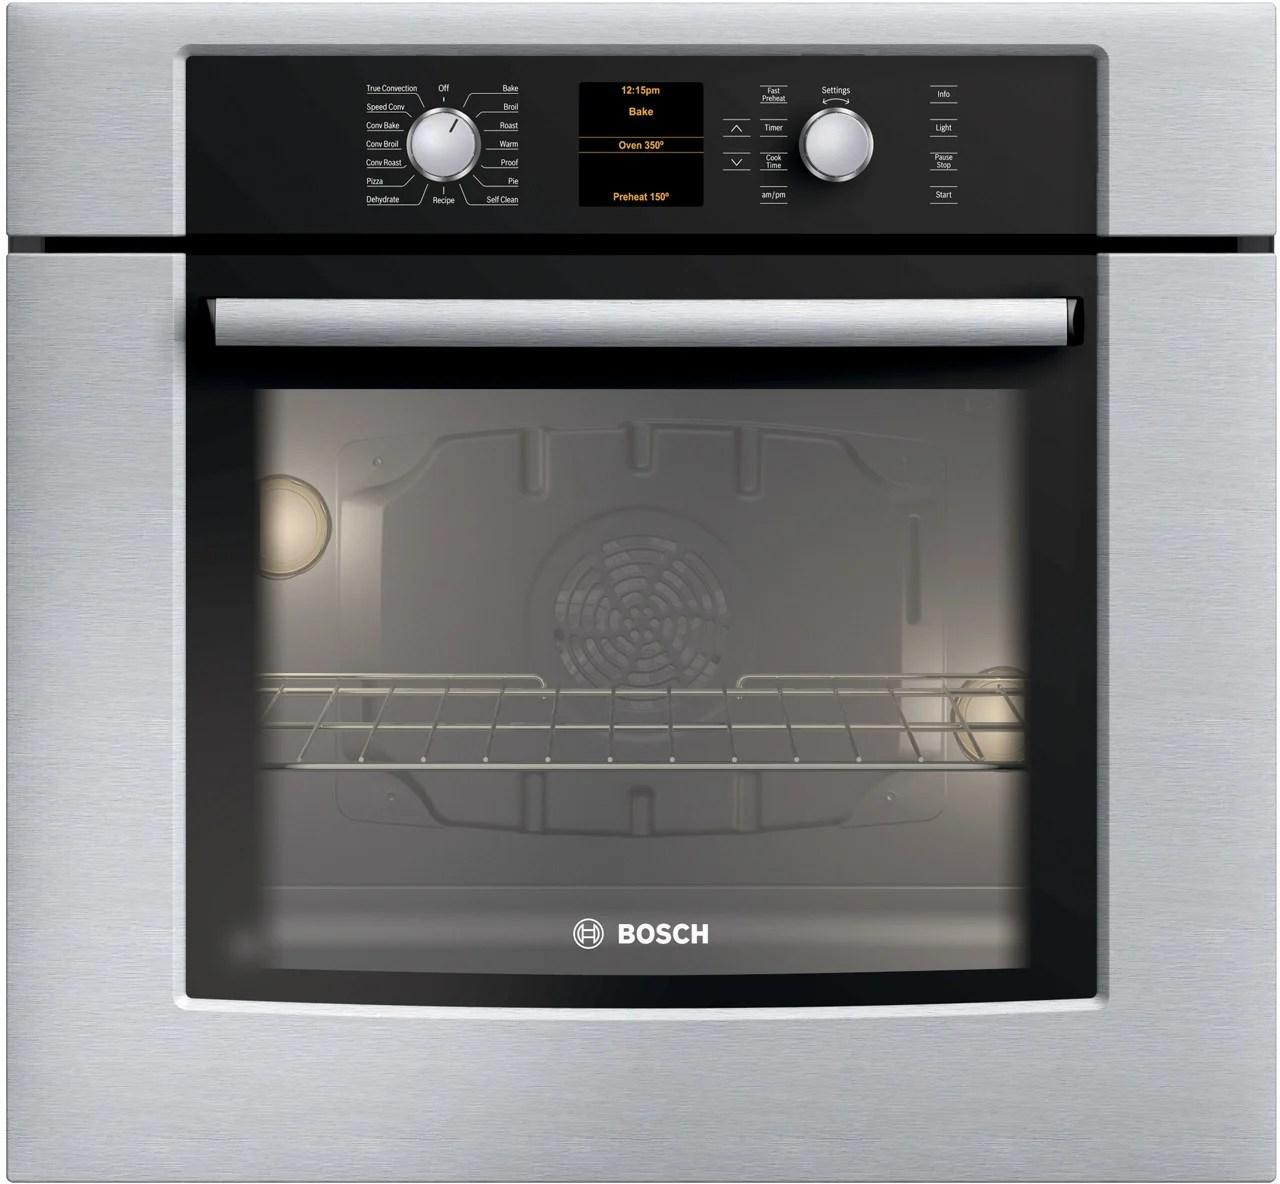 Bosch Double Oven Gas Range